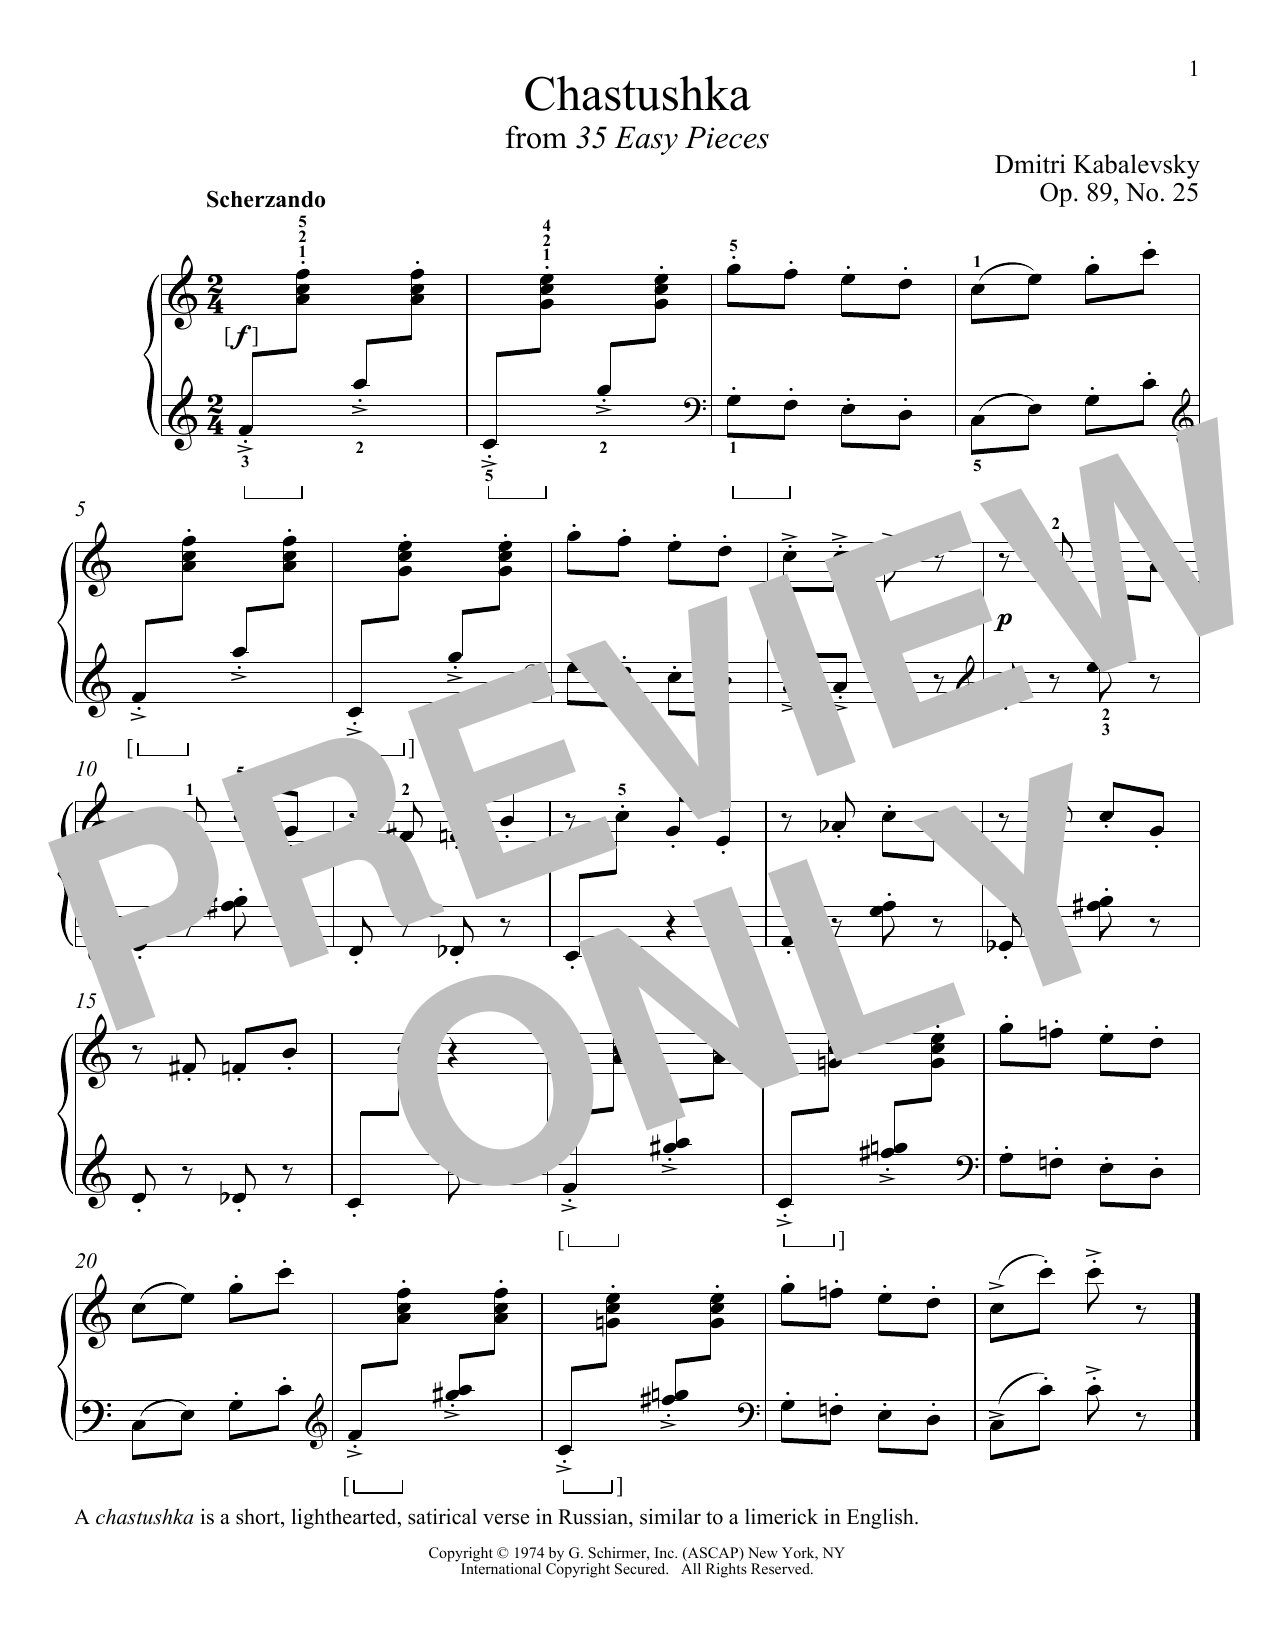 Download Dmitri Kabalevsky 'Chastushka, Op. 89, No. 25' Digital Sheet Music Notes & Chords and start playing in minutes